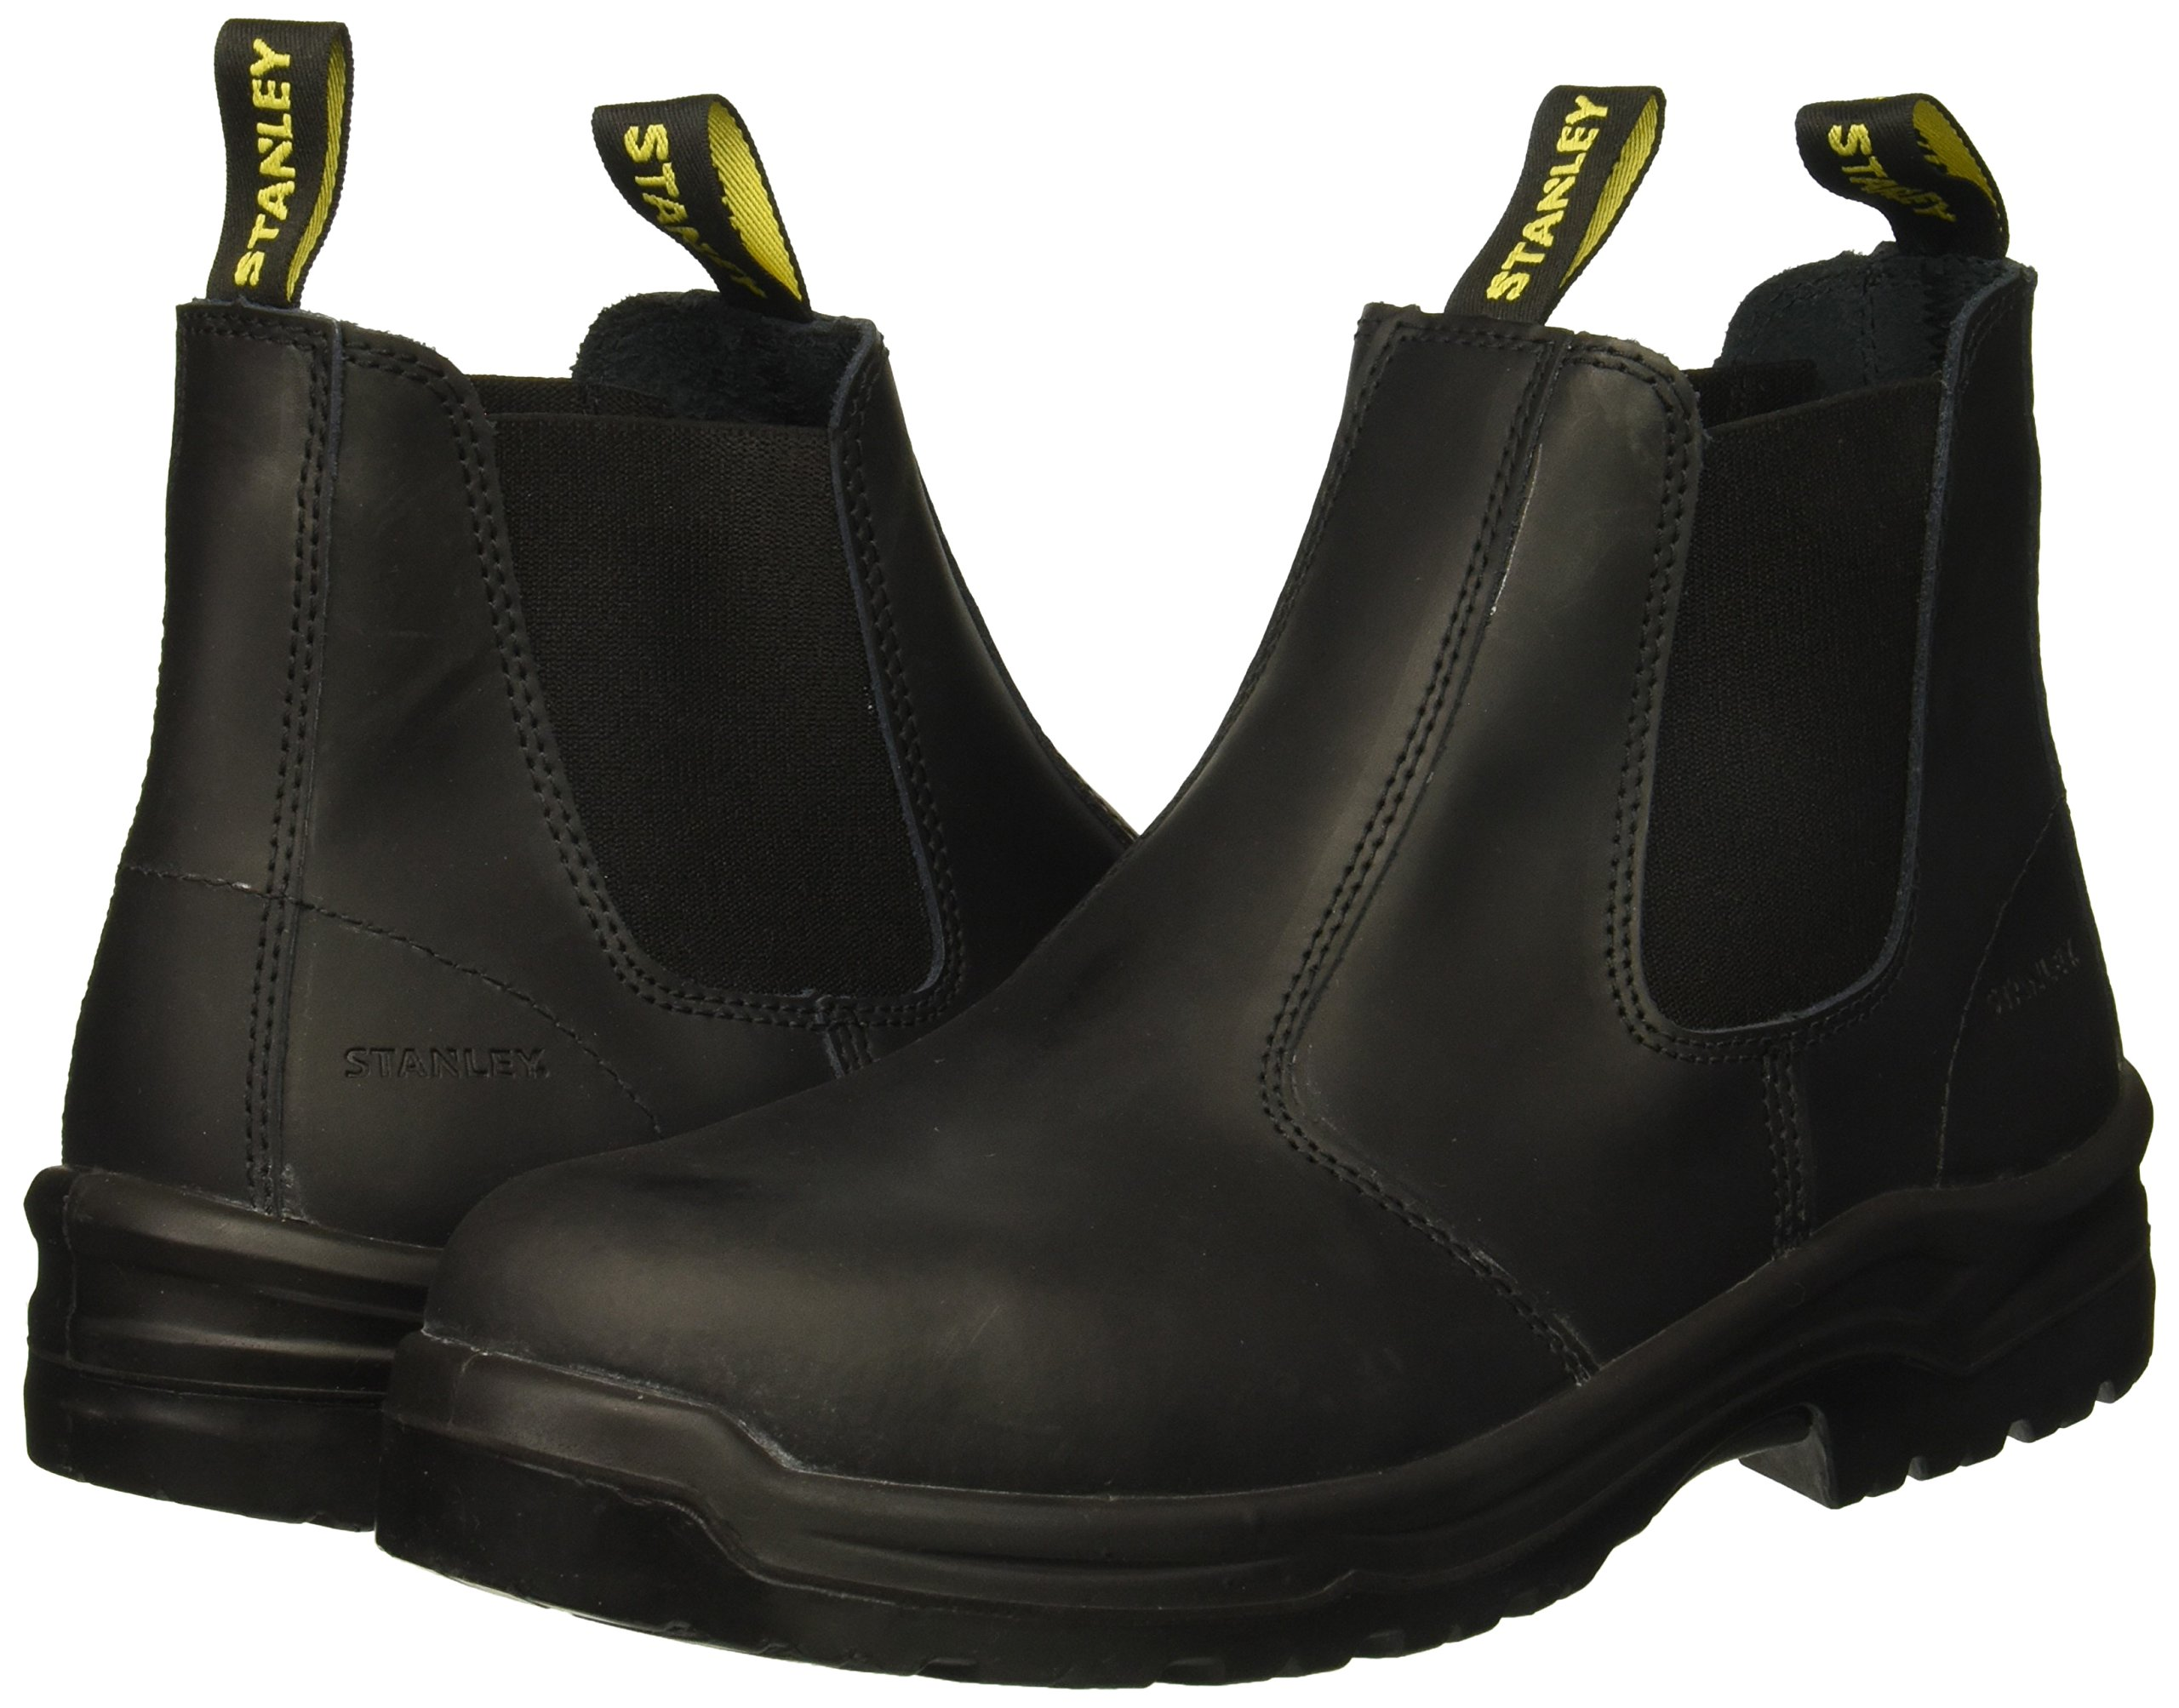 Stanley Men's Dredge Soft Toe Industrial and Construction Shoe, Black, 10 M US by Stanley